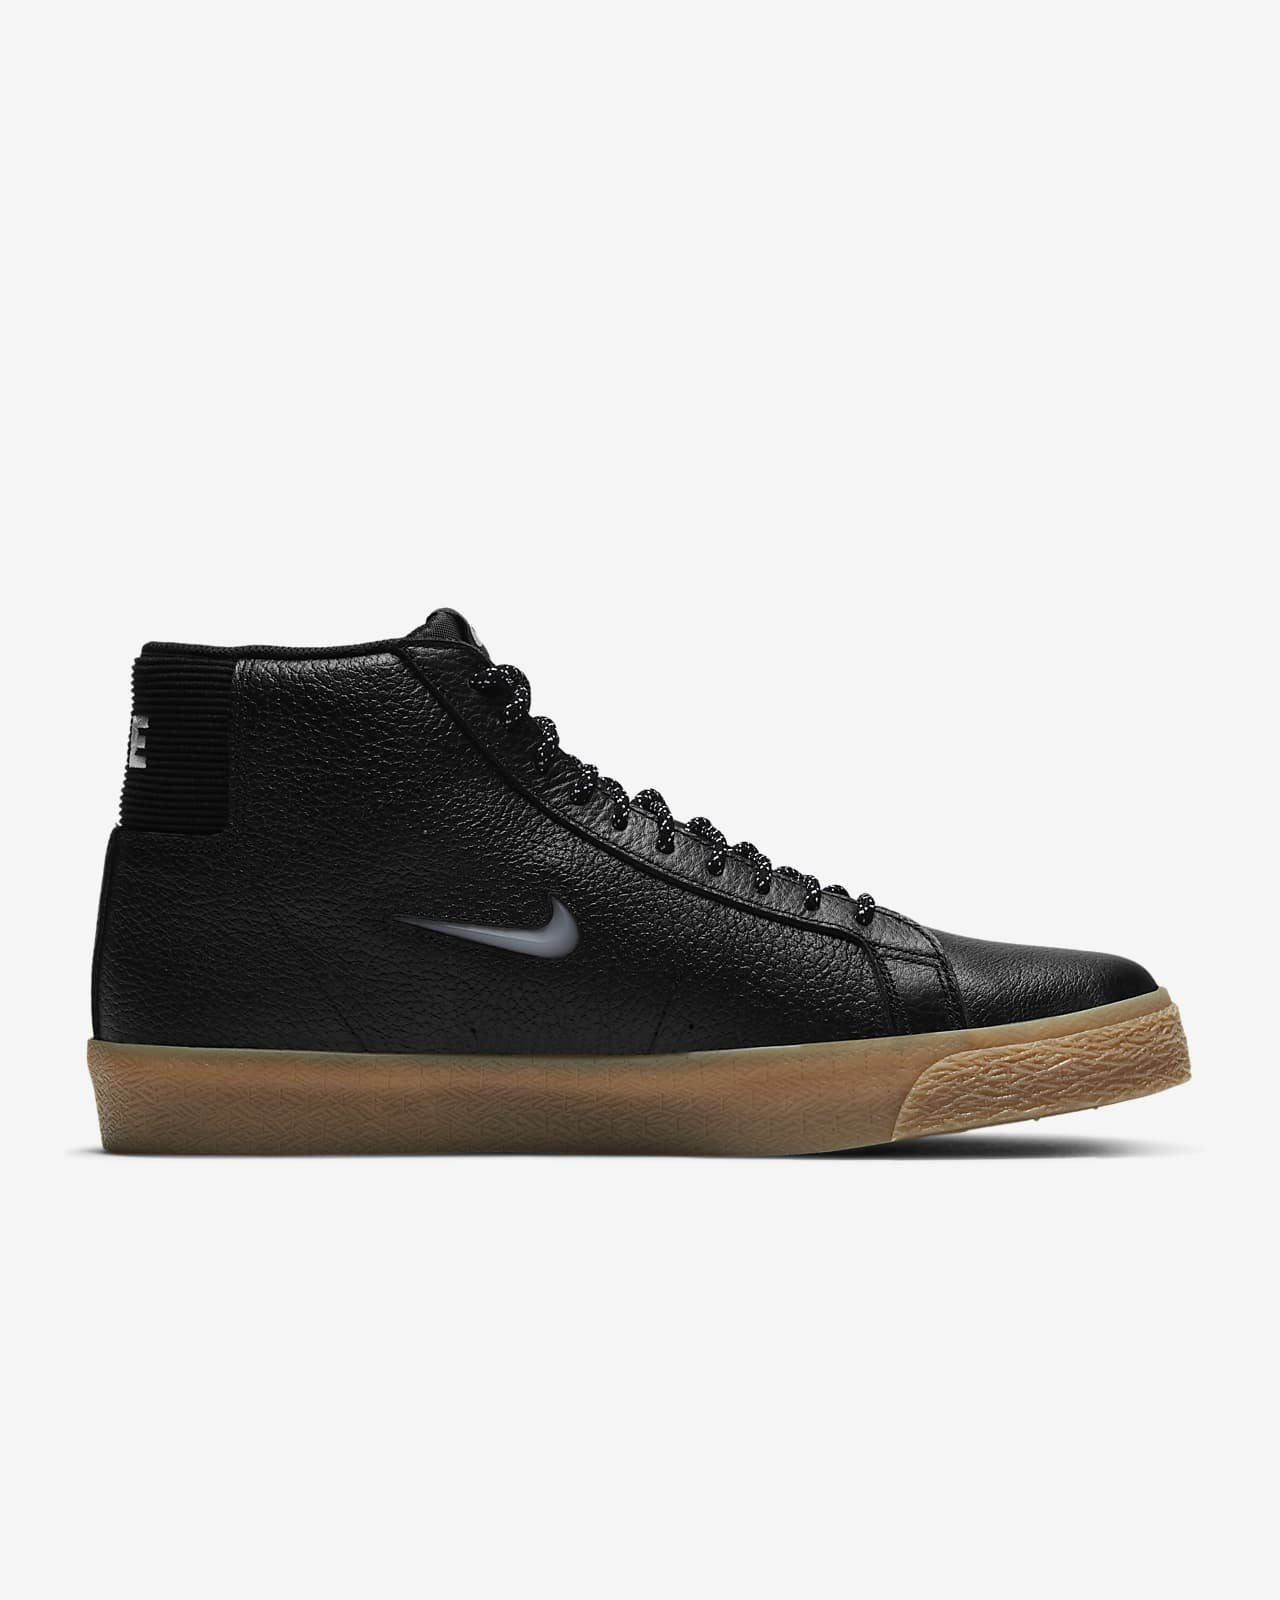 Nike SB Blazer Mid Premium Black/Black/Gum Light Brown/White